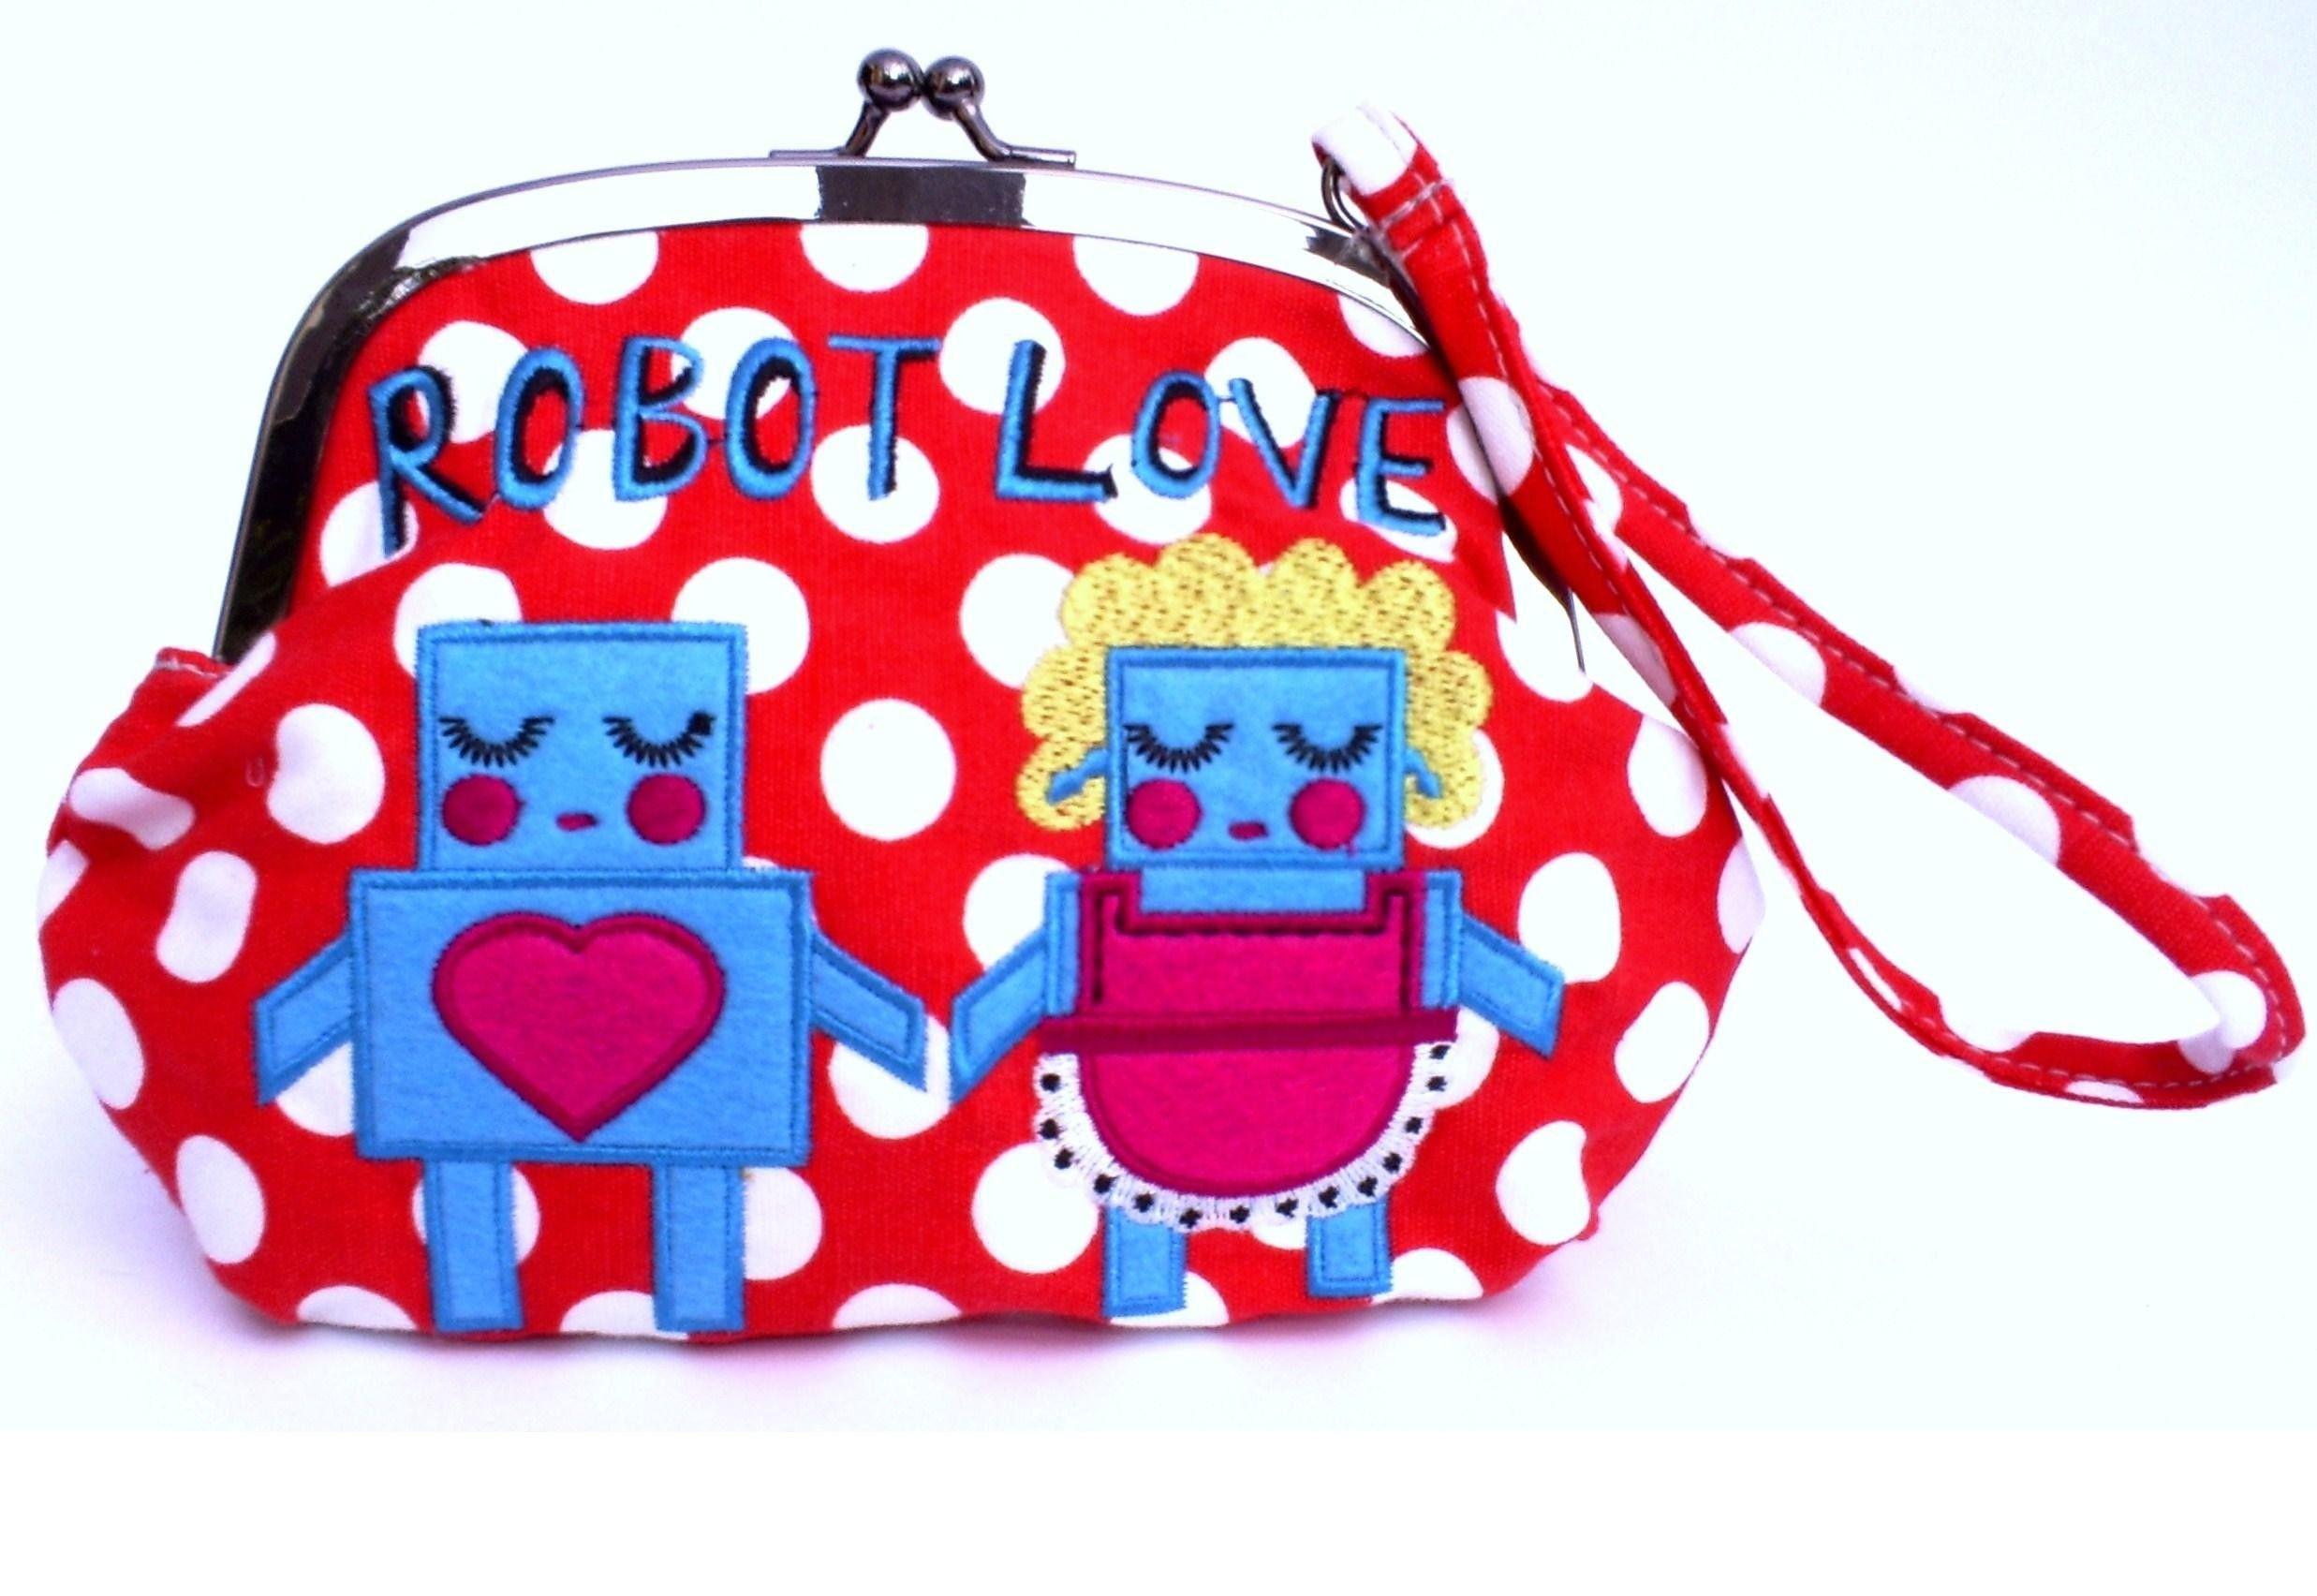 Robot Love Wristlet, by http://www.kategarey.com